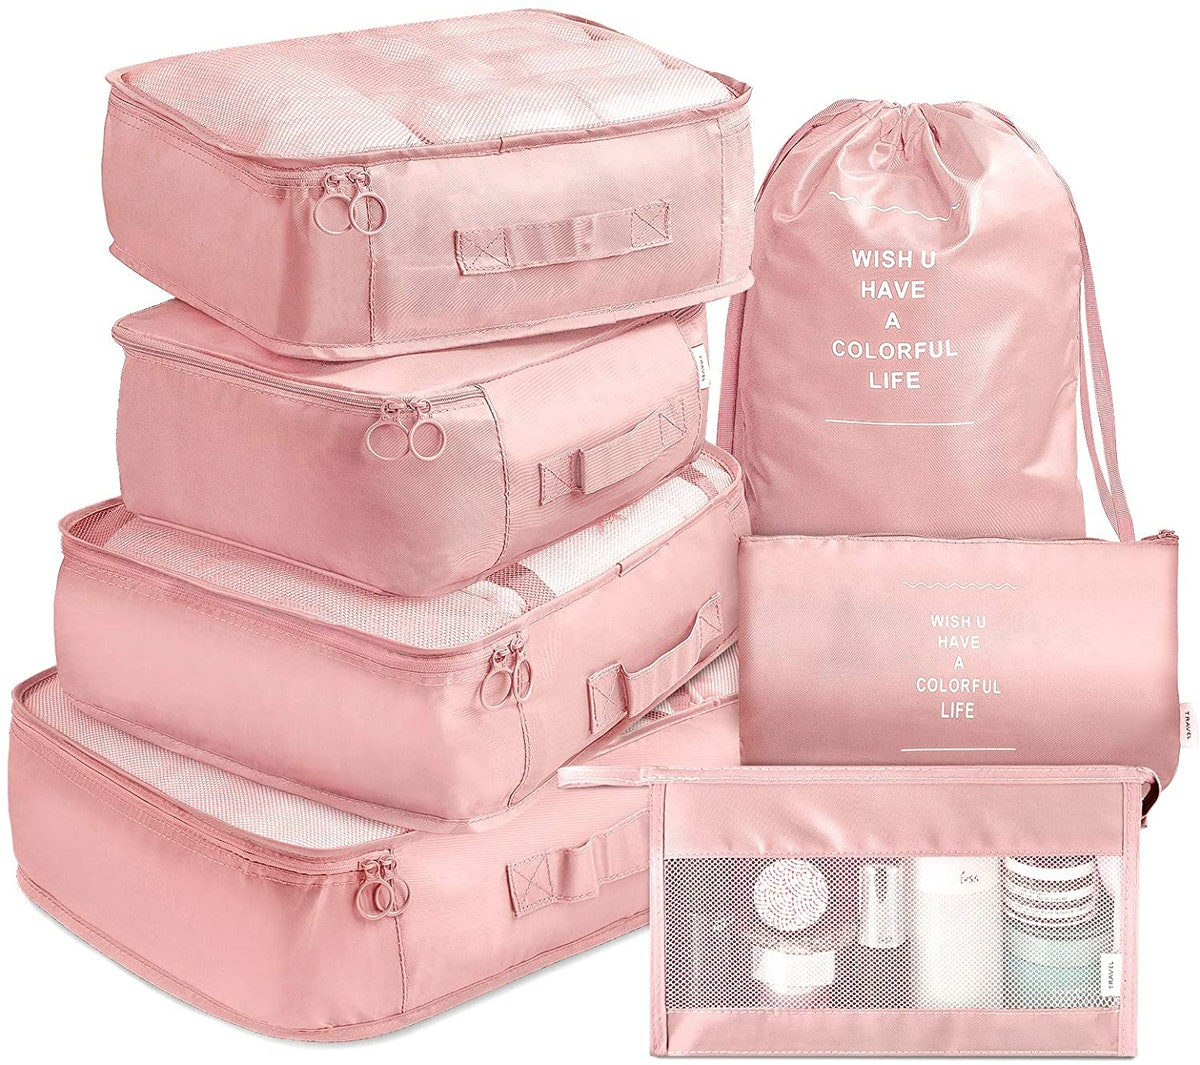 VAGREEZ Packing Cubes Set With Toiletry Bag (7-Pcs)